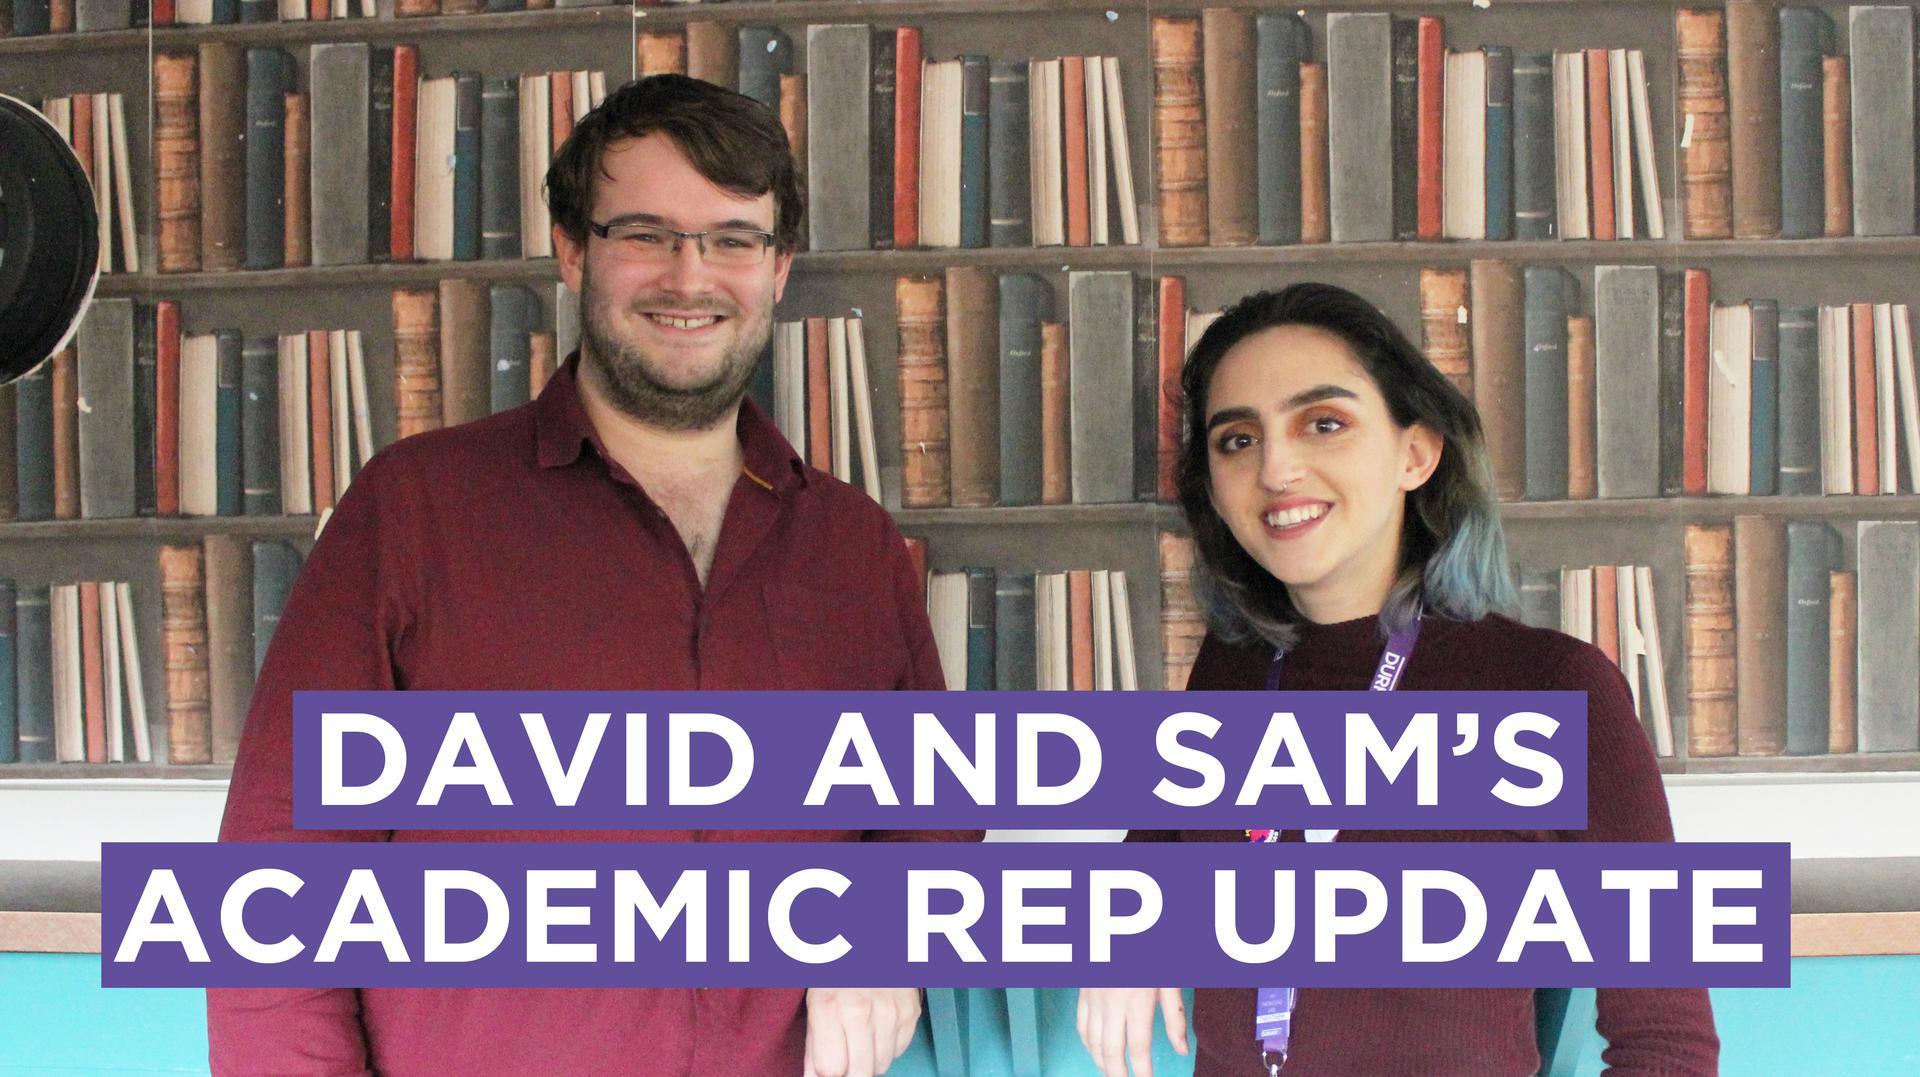 David and Saul's Academic Update